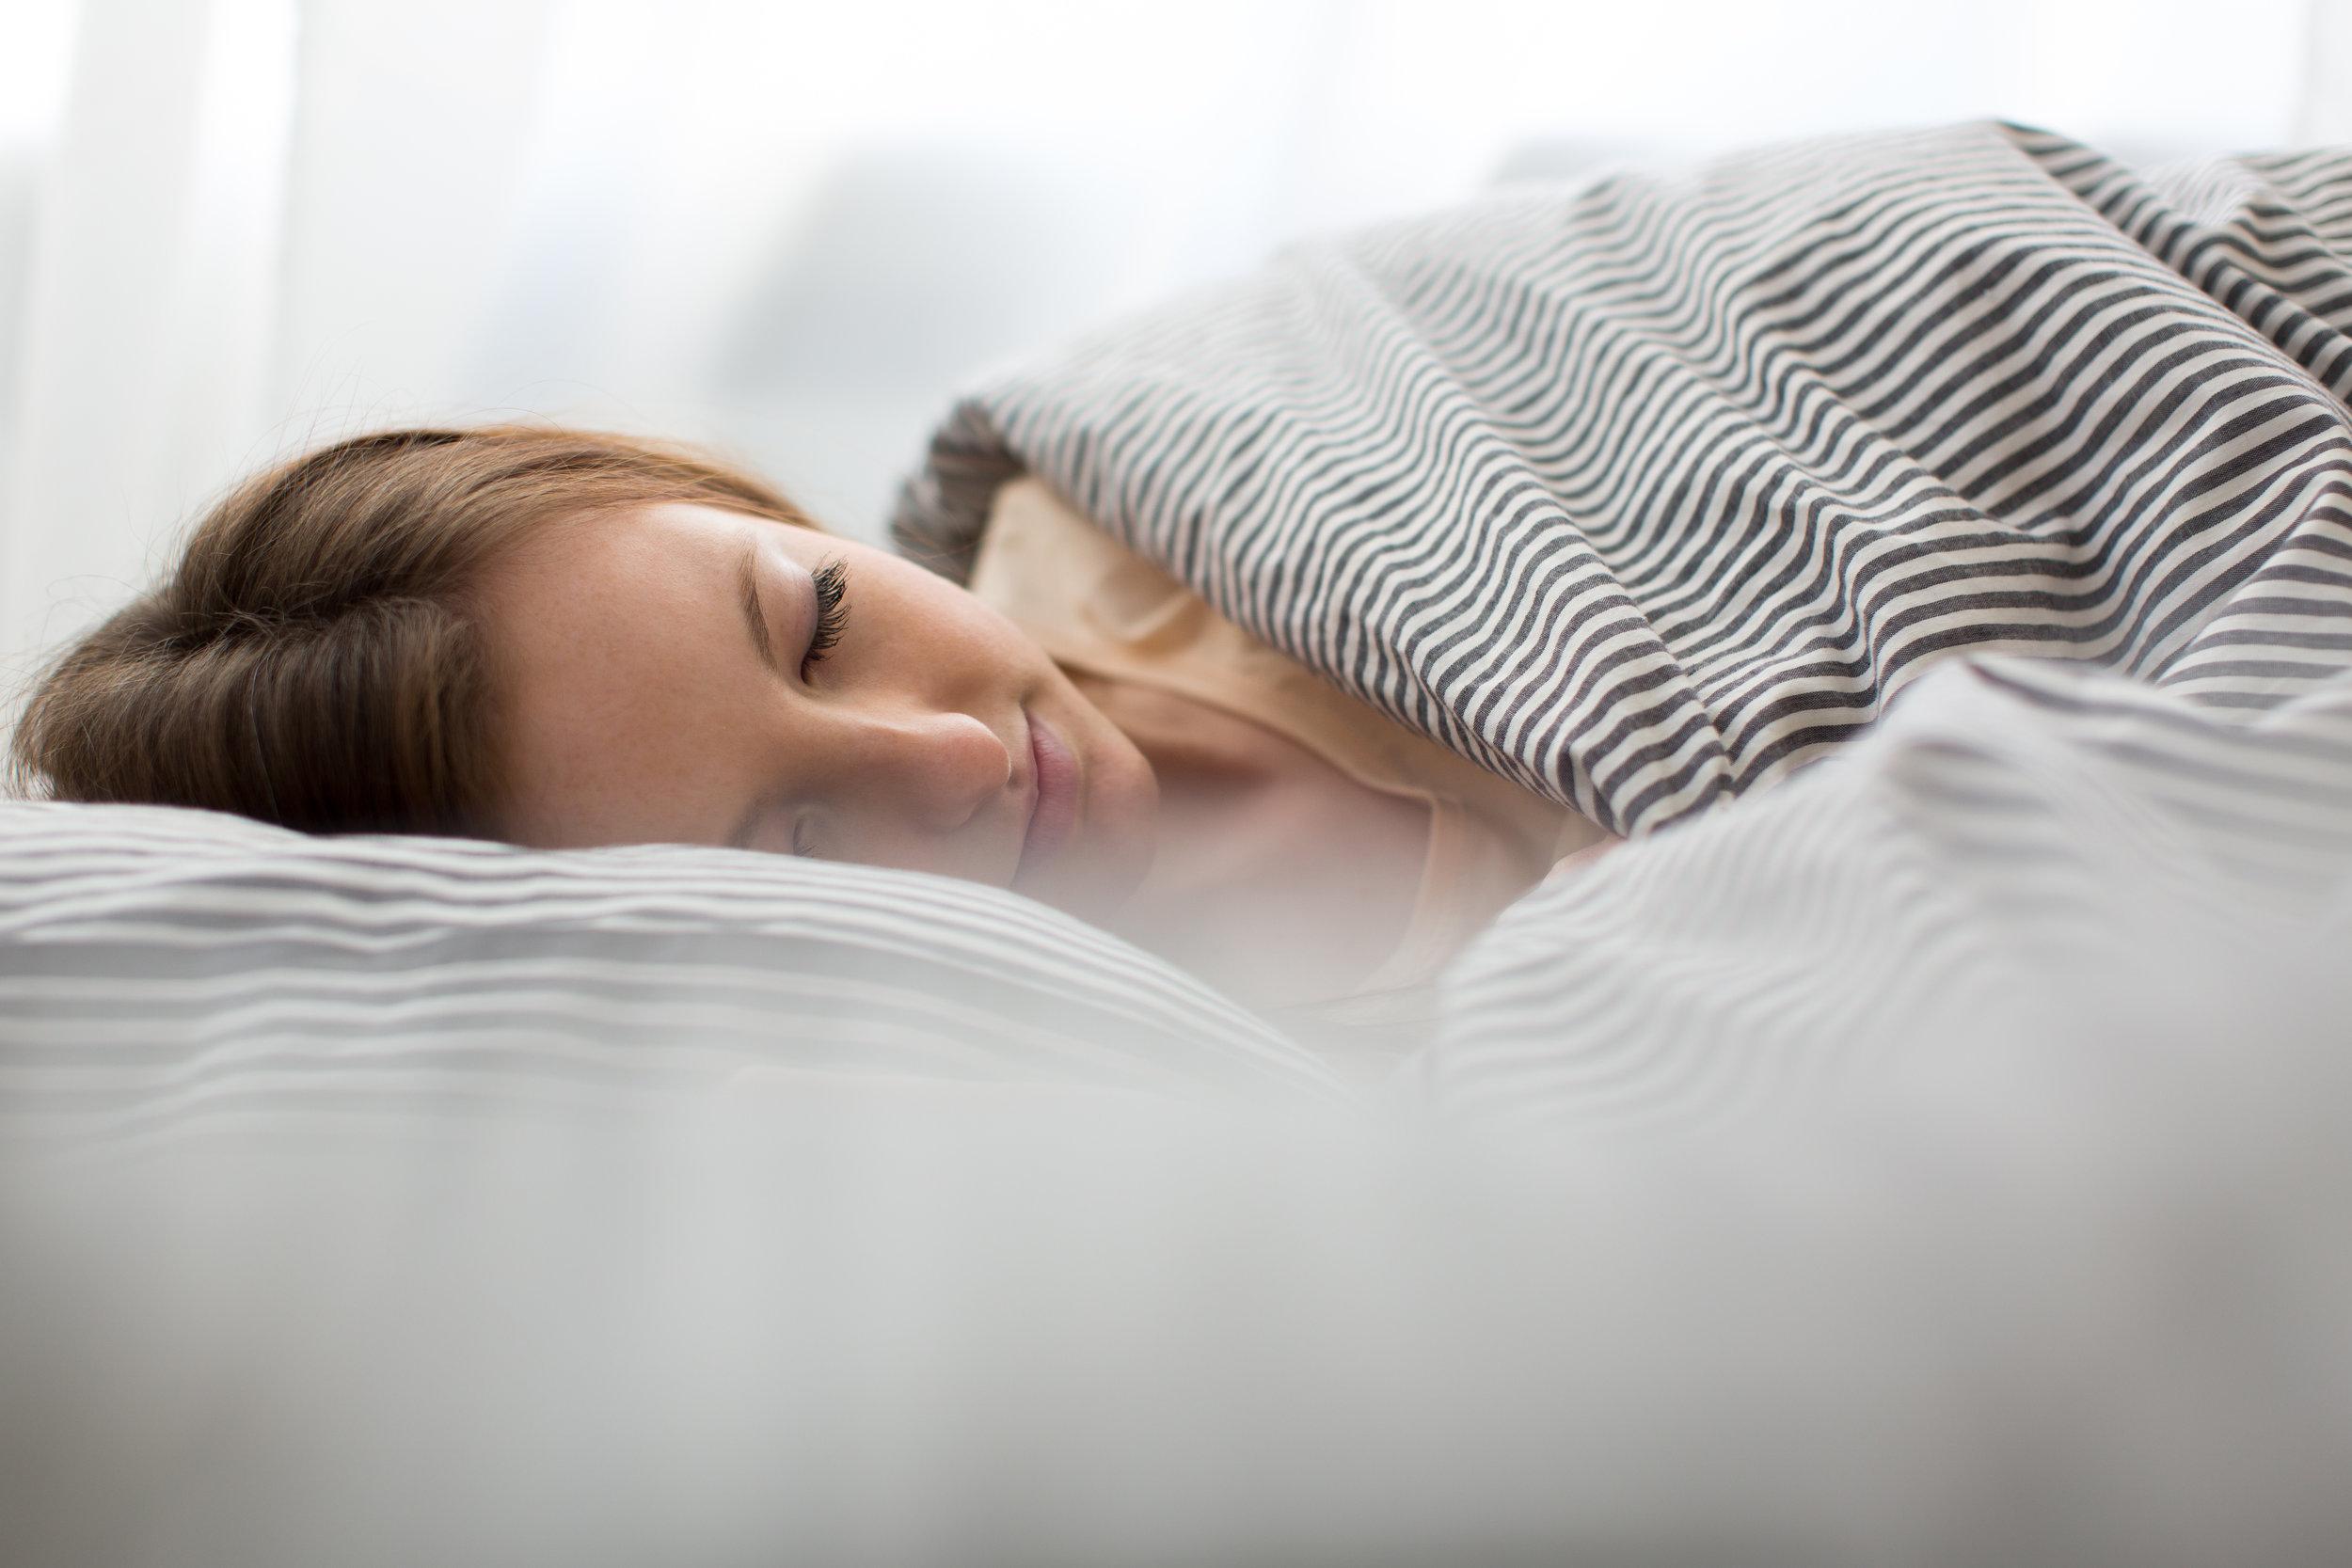 bigstock-Beautiful-young-woman-sleeping-95805215.jpg